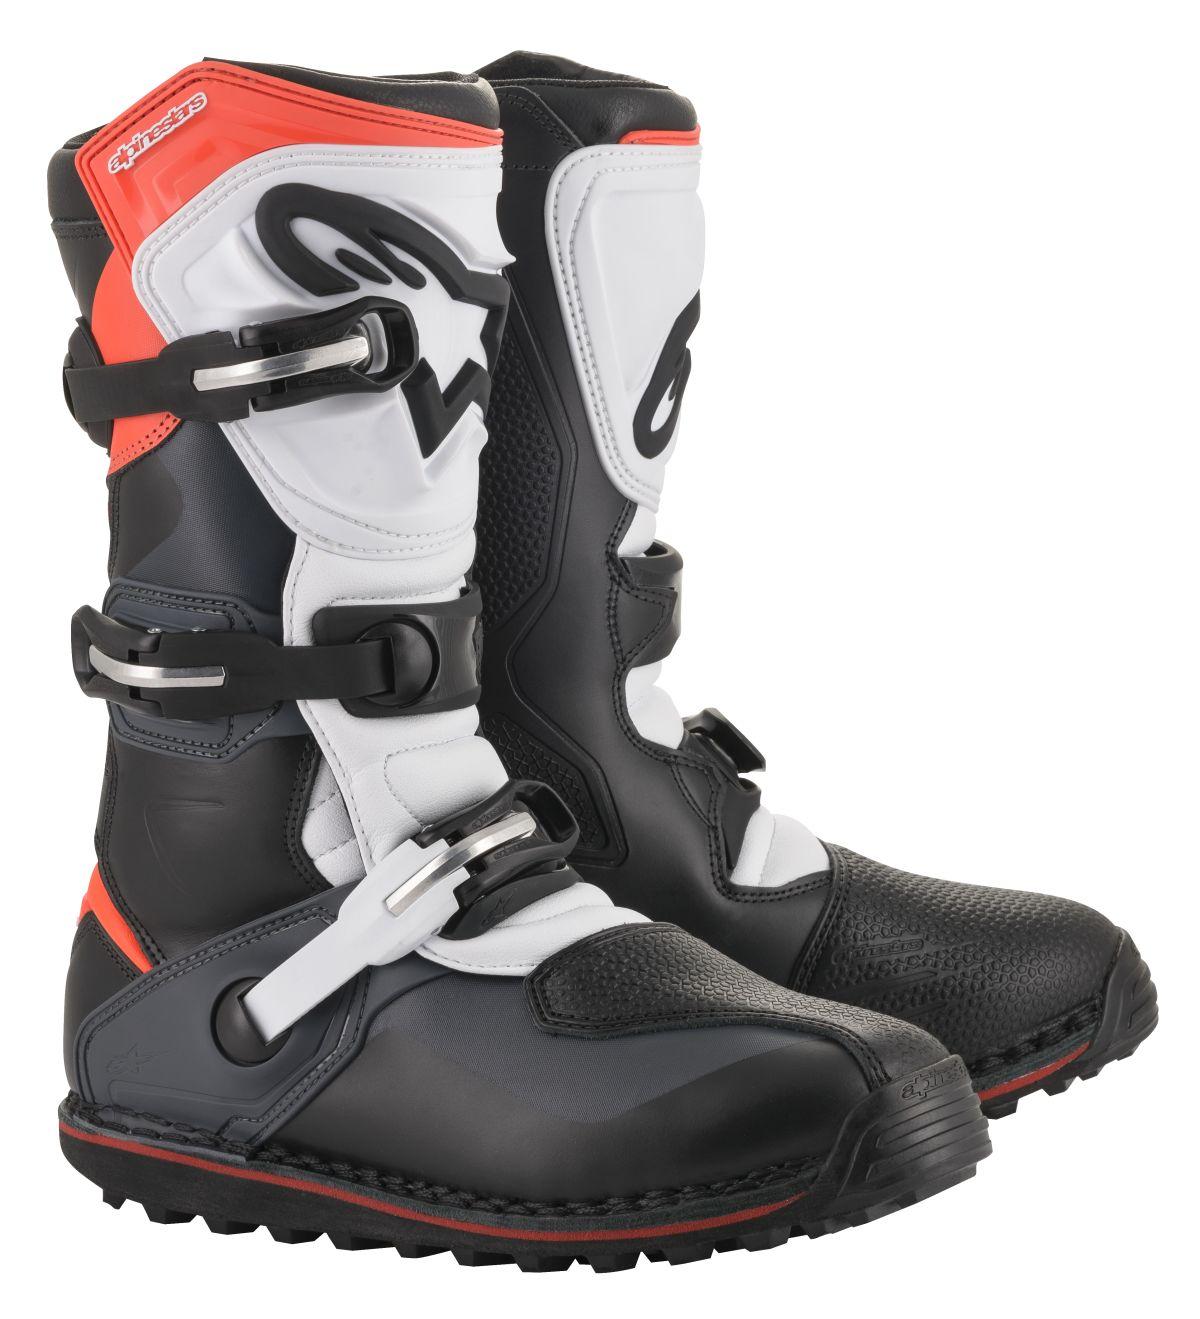 Alpinestars Enduro Laarzen TECH-T BK/GY/RD 7